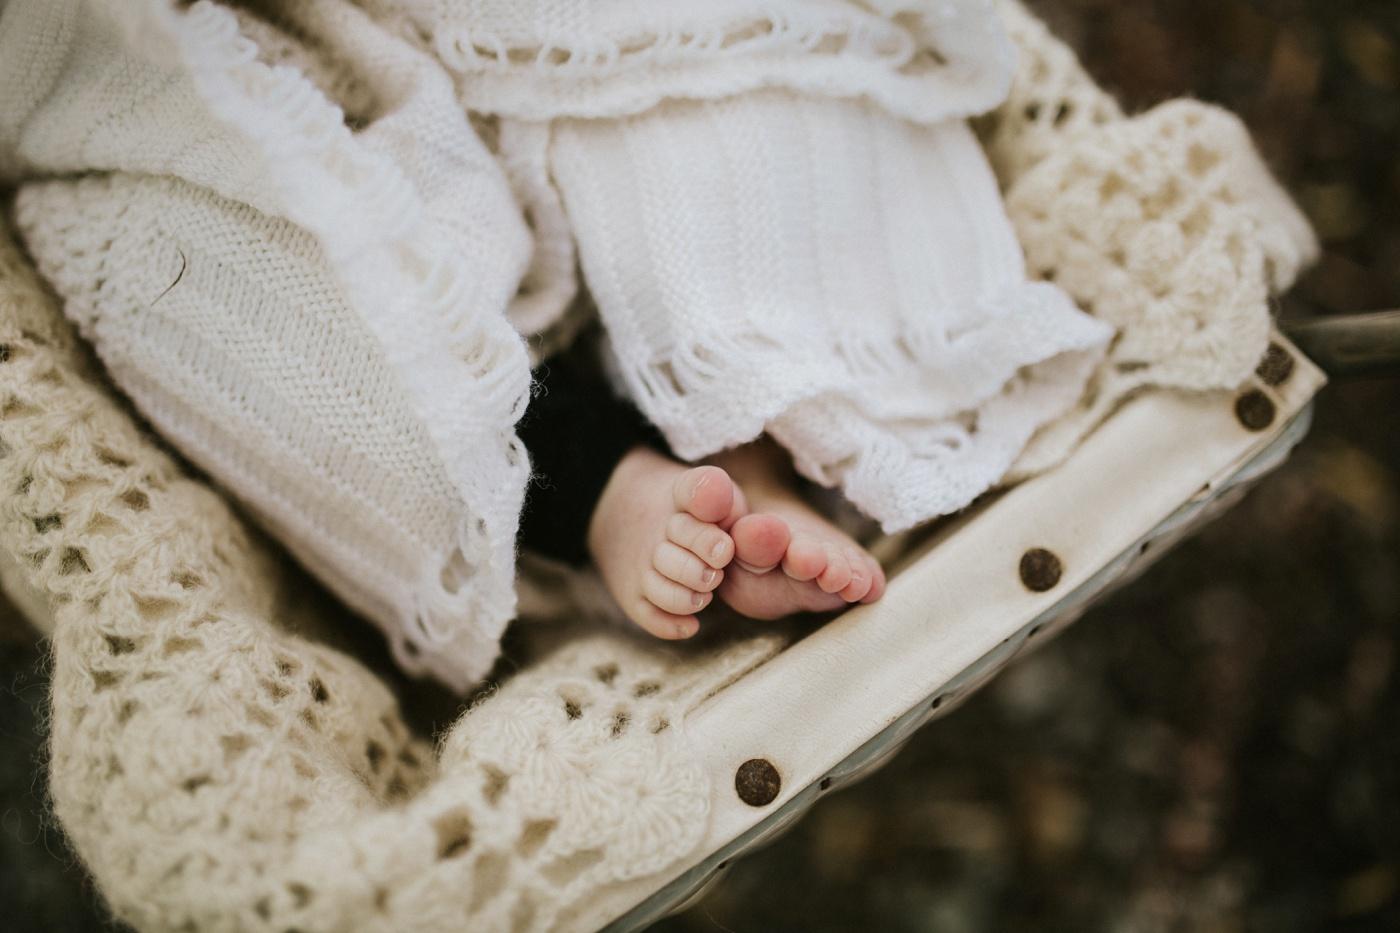 Blake-Lily-Rolig-Lekfull-Familjesession-Familjefotograf-Stockholm-Orebro_33